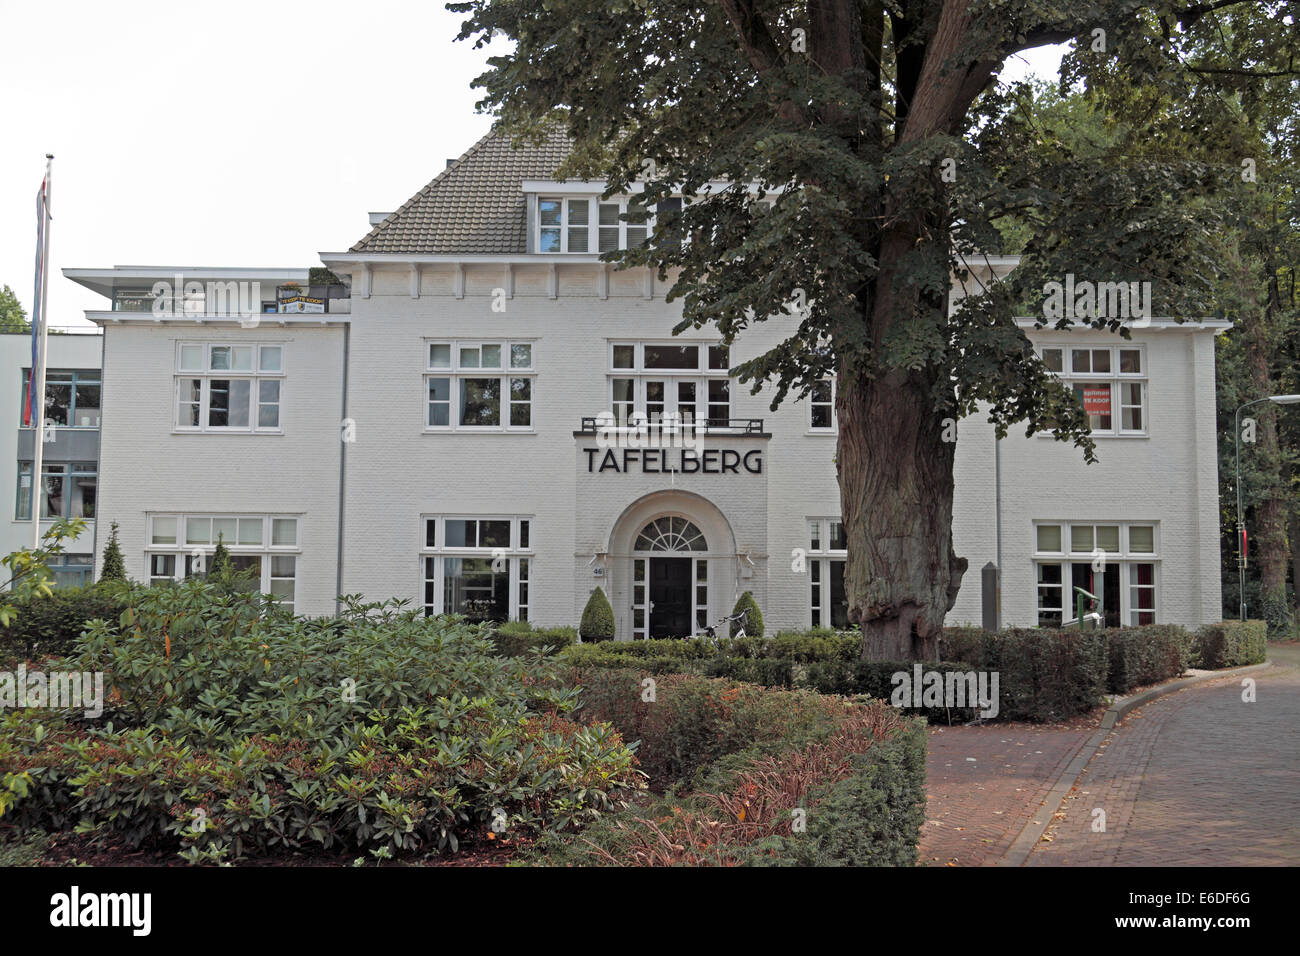 The Tafelberg, HQ for German commander Field-Marshall Walther Model in Oosterbeek, Arnhem, Gelderland, Netherlands. - Stock Image